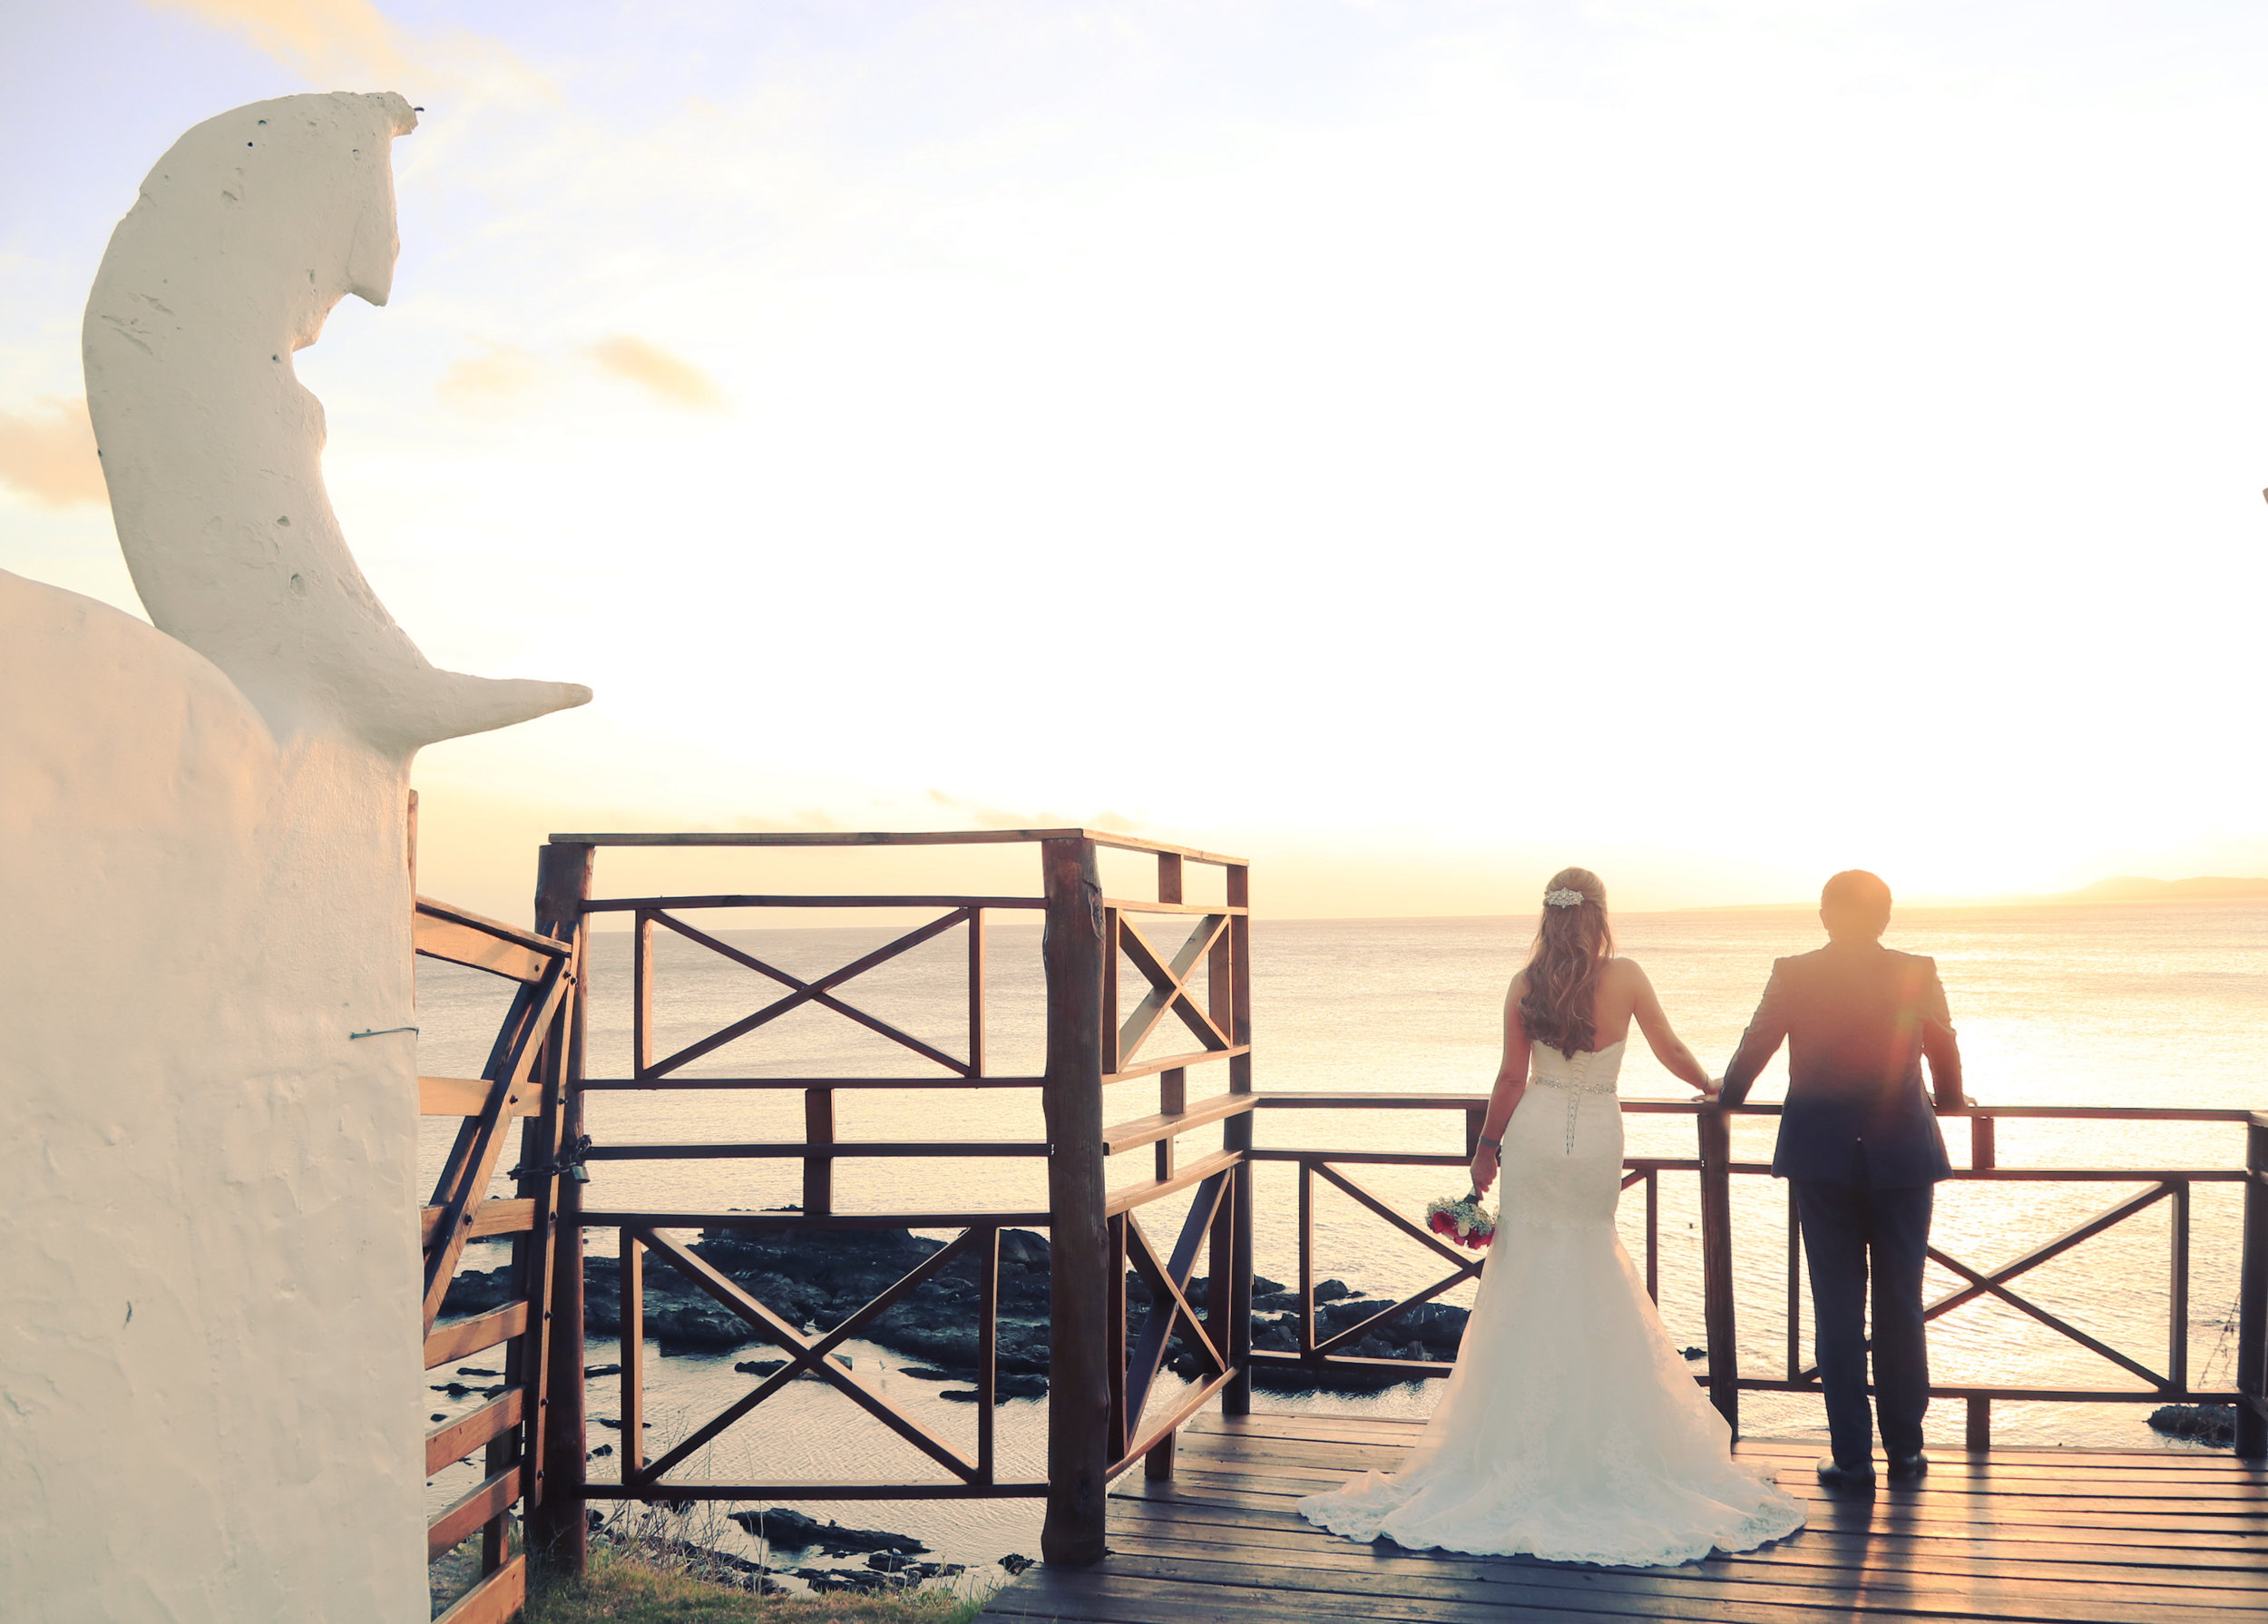 18-Fotografía-Bodas-Casamiento-Eventos-Fiesta-Diego-Piuma.jpeg